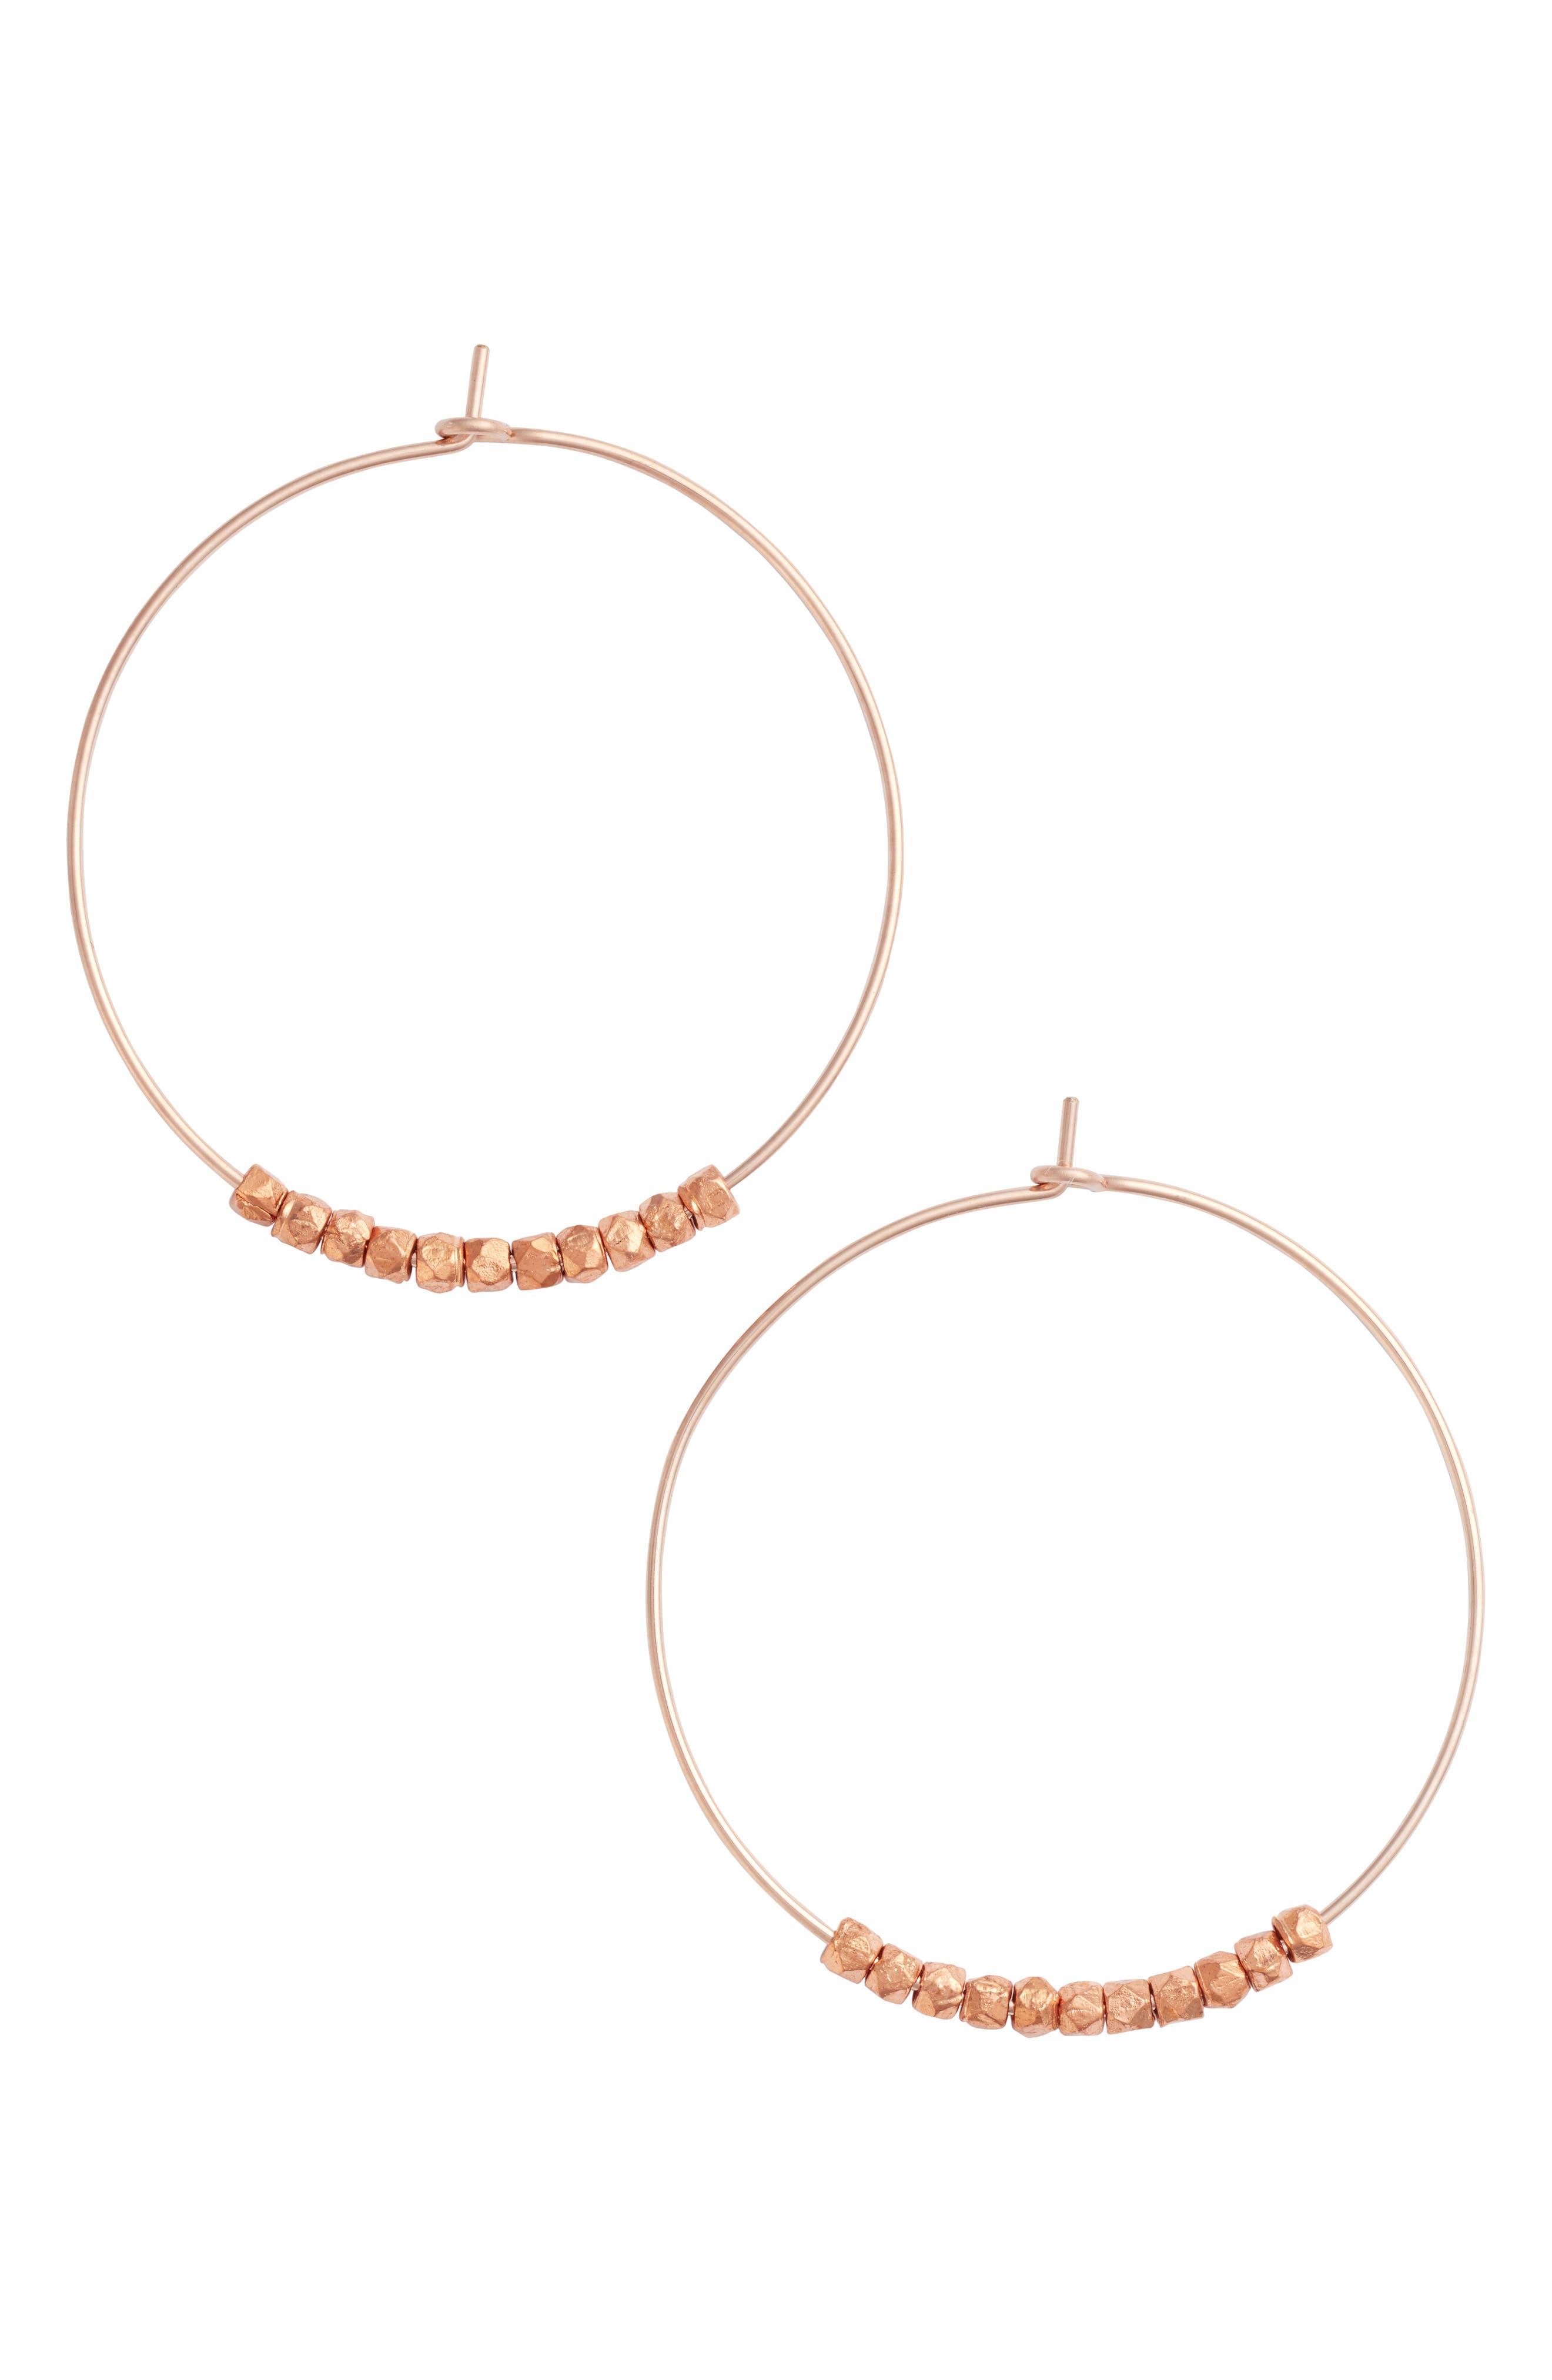 Alternate Image 1 Selected - Nashelle Karly Glistening Hoop Earrings